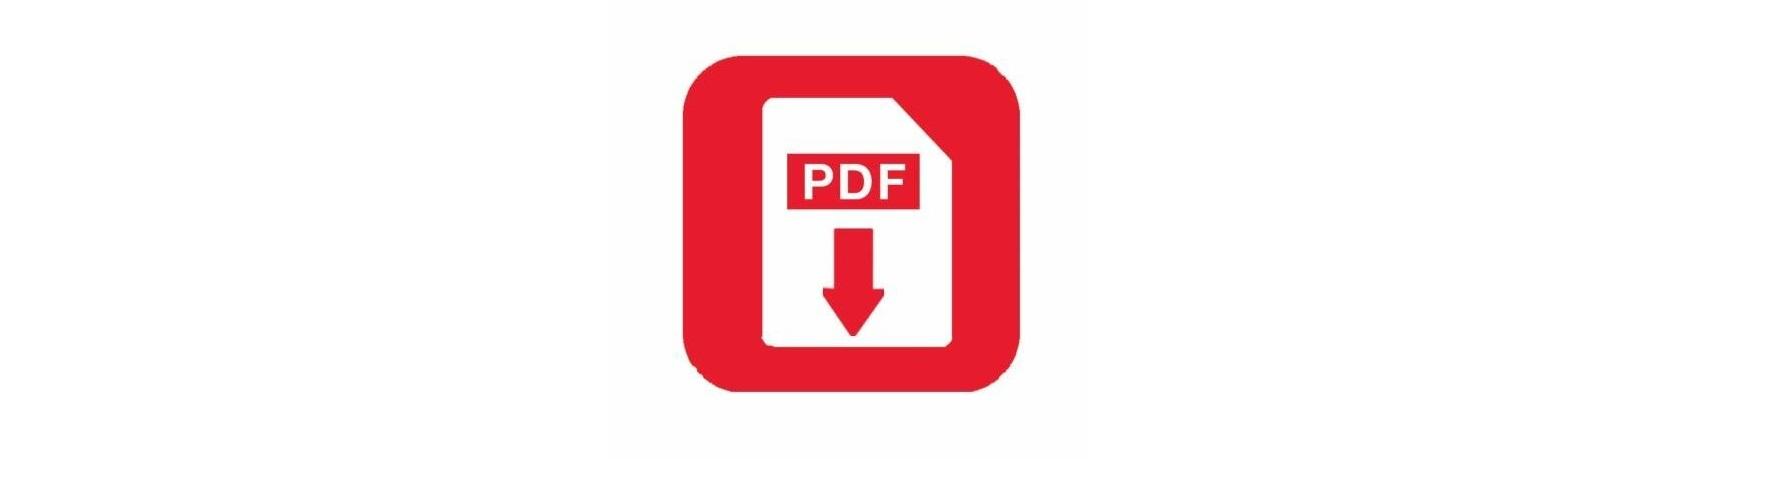 PHP TÉLÉCHARGER HTML2PDF